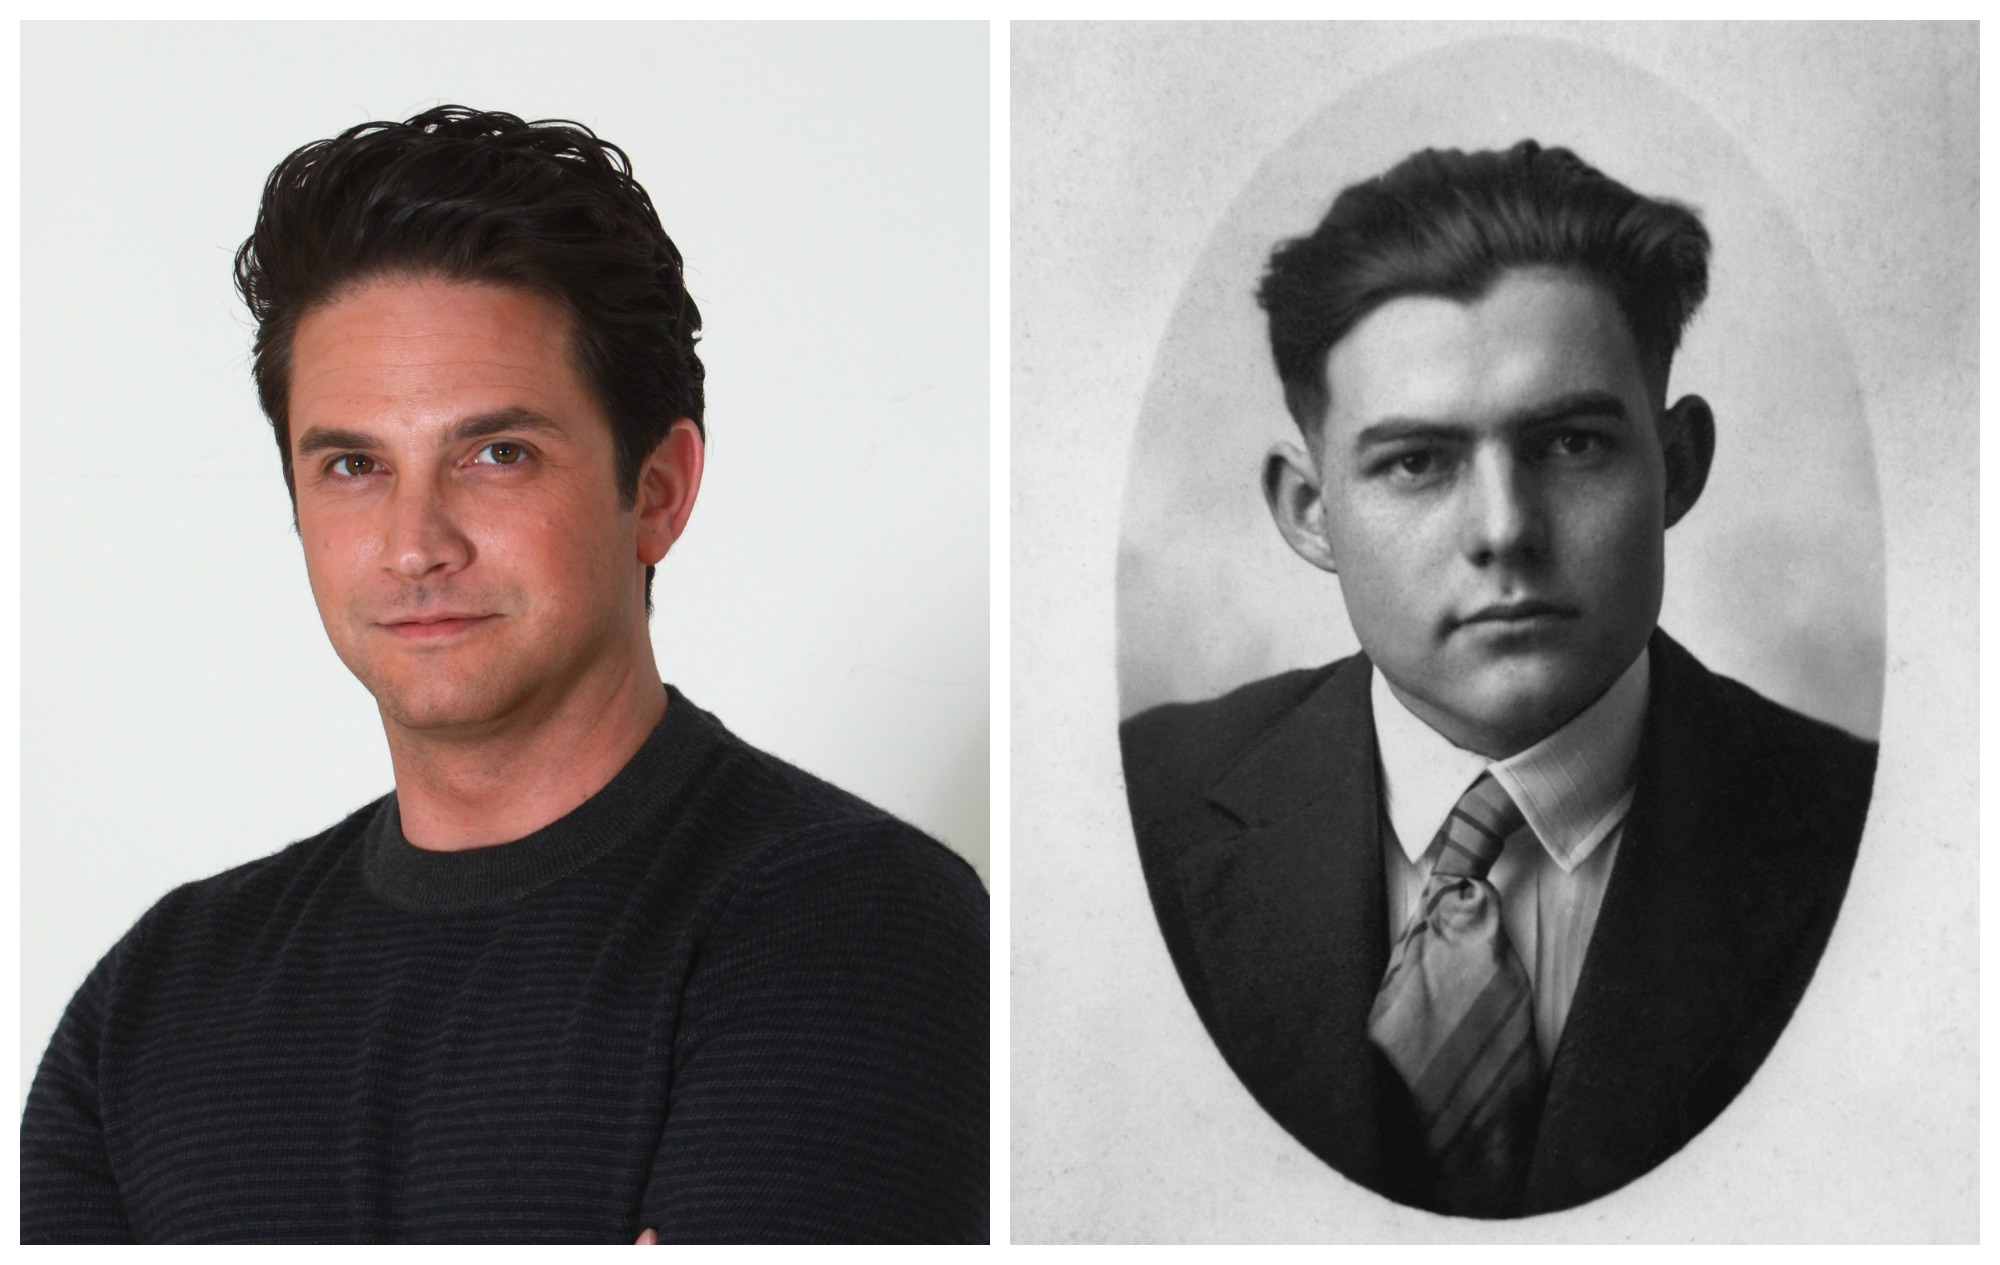 Brandon Barash and Ernest Hemingway - Warren/Getty